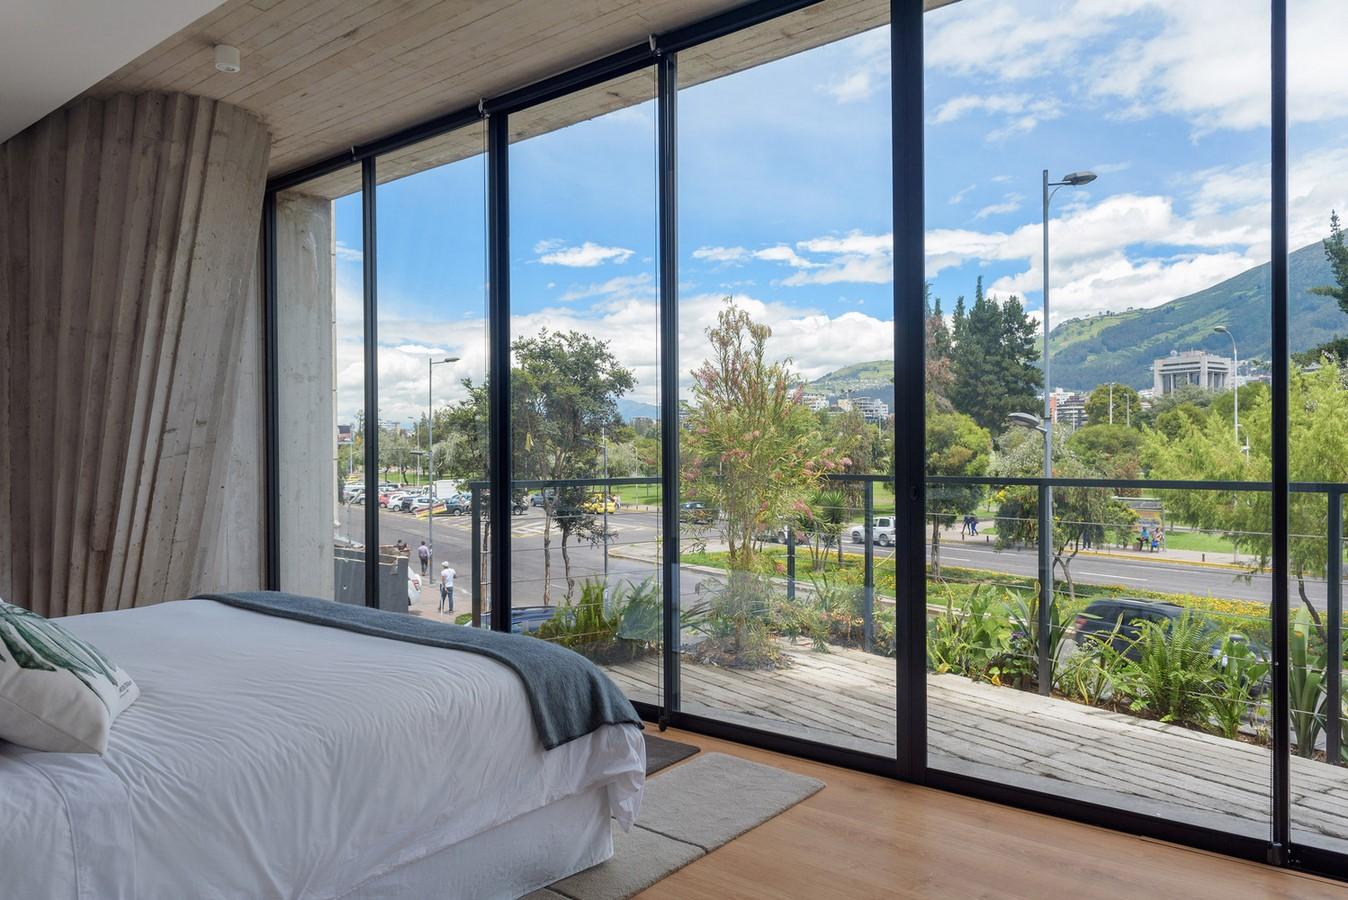 10 Examples of Innovative facade design solutions - Sheet23